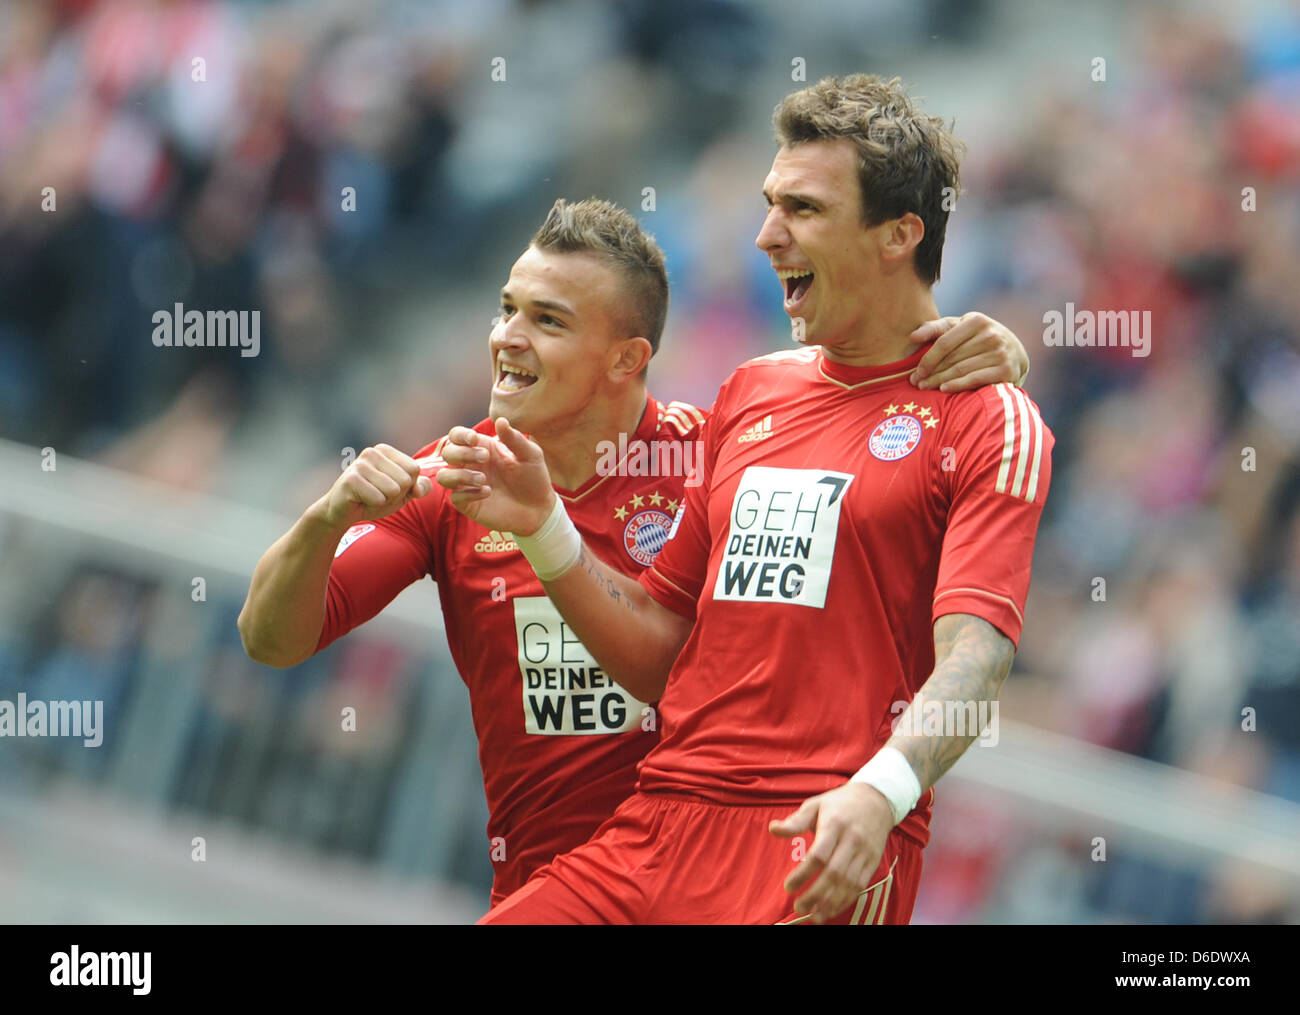 Xherdan Shaqiri L And Goal Scorer Mario Mandzukic Celebrate The 1 0 Stock Photo Alamy